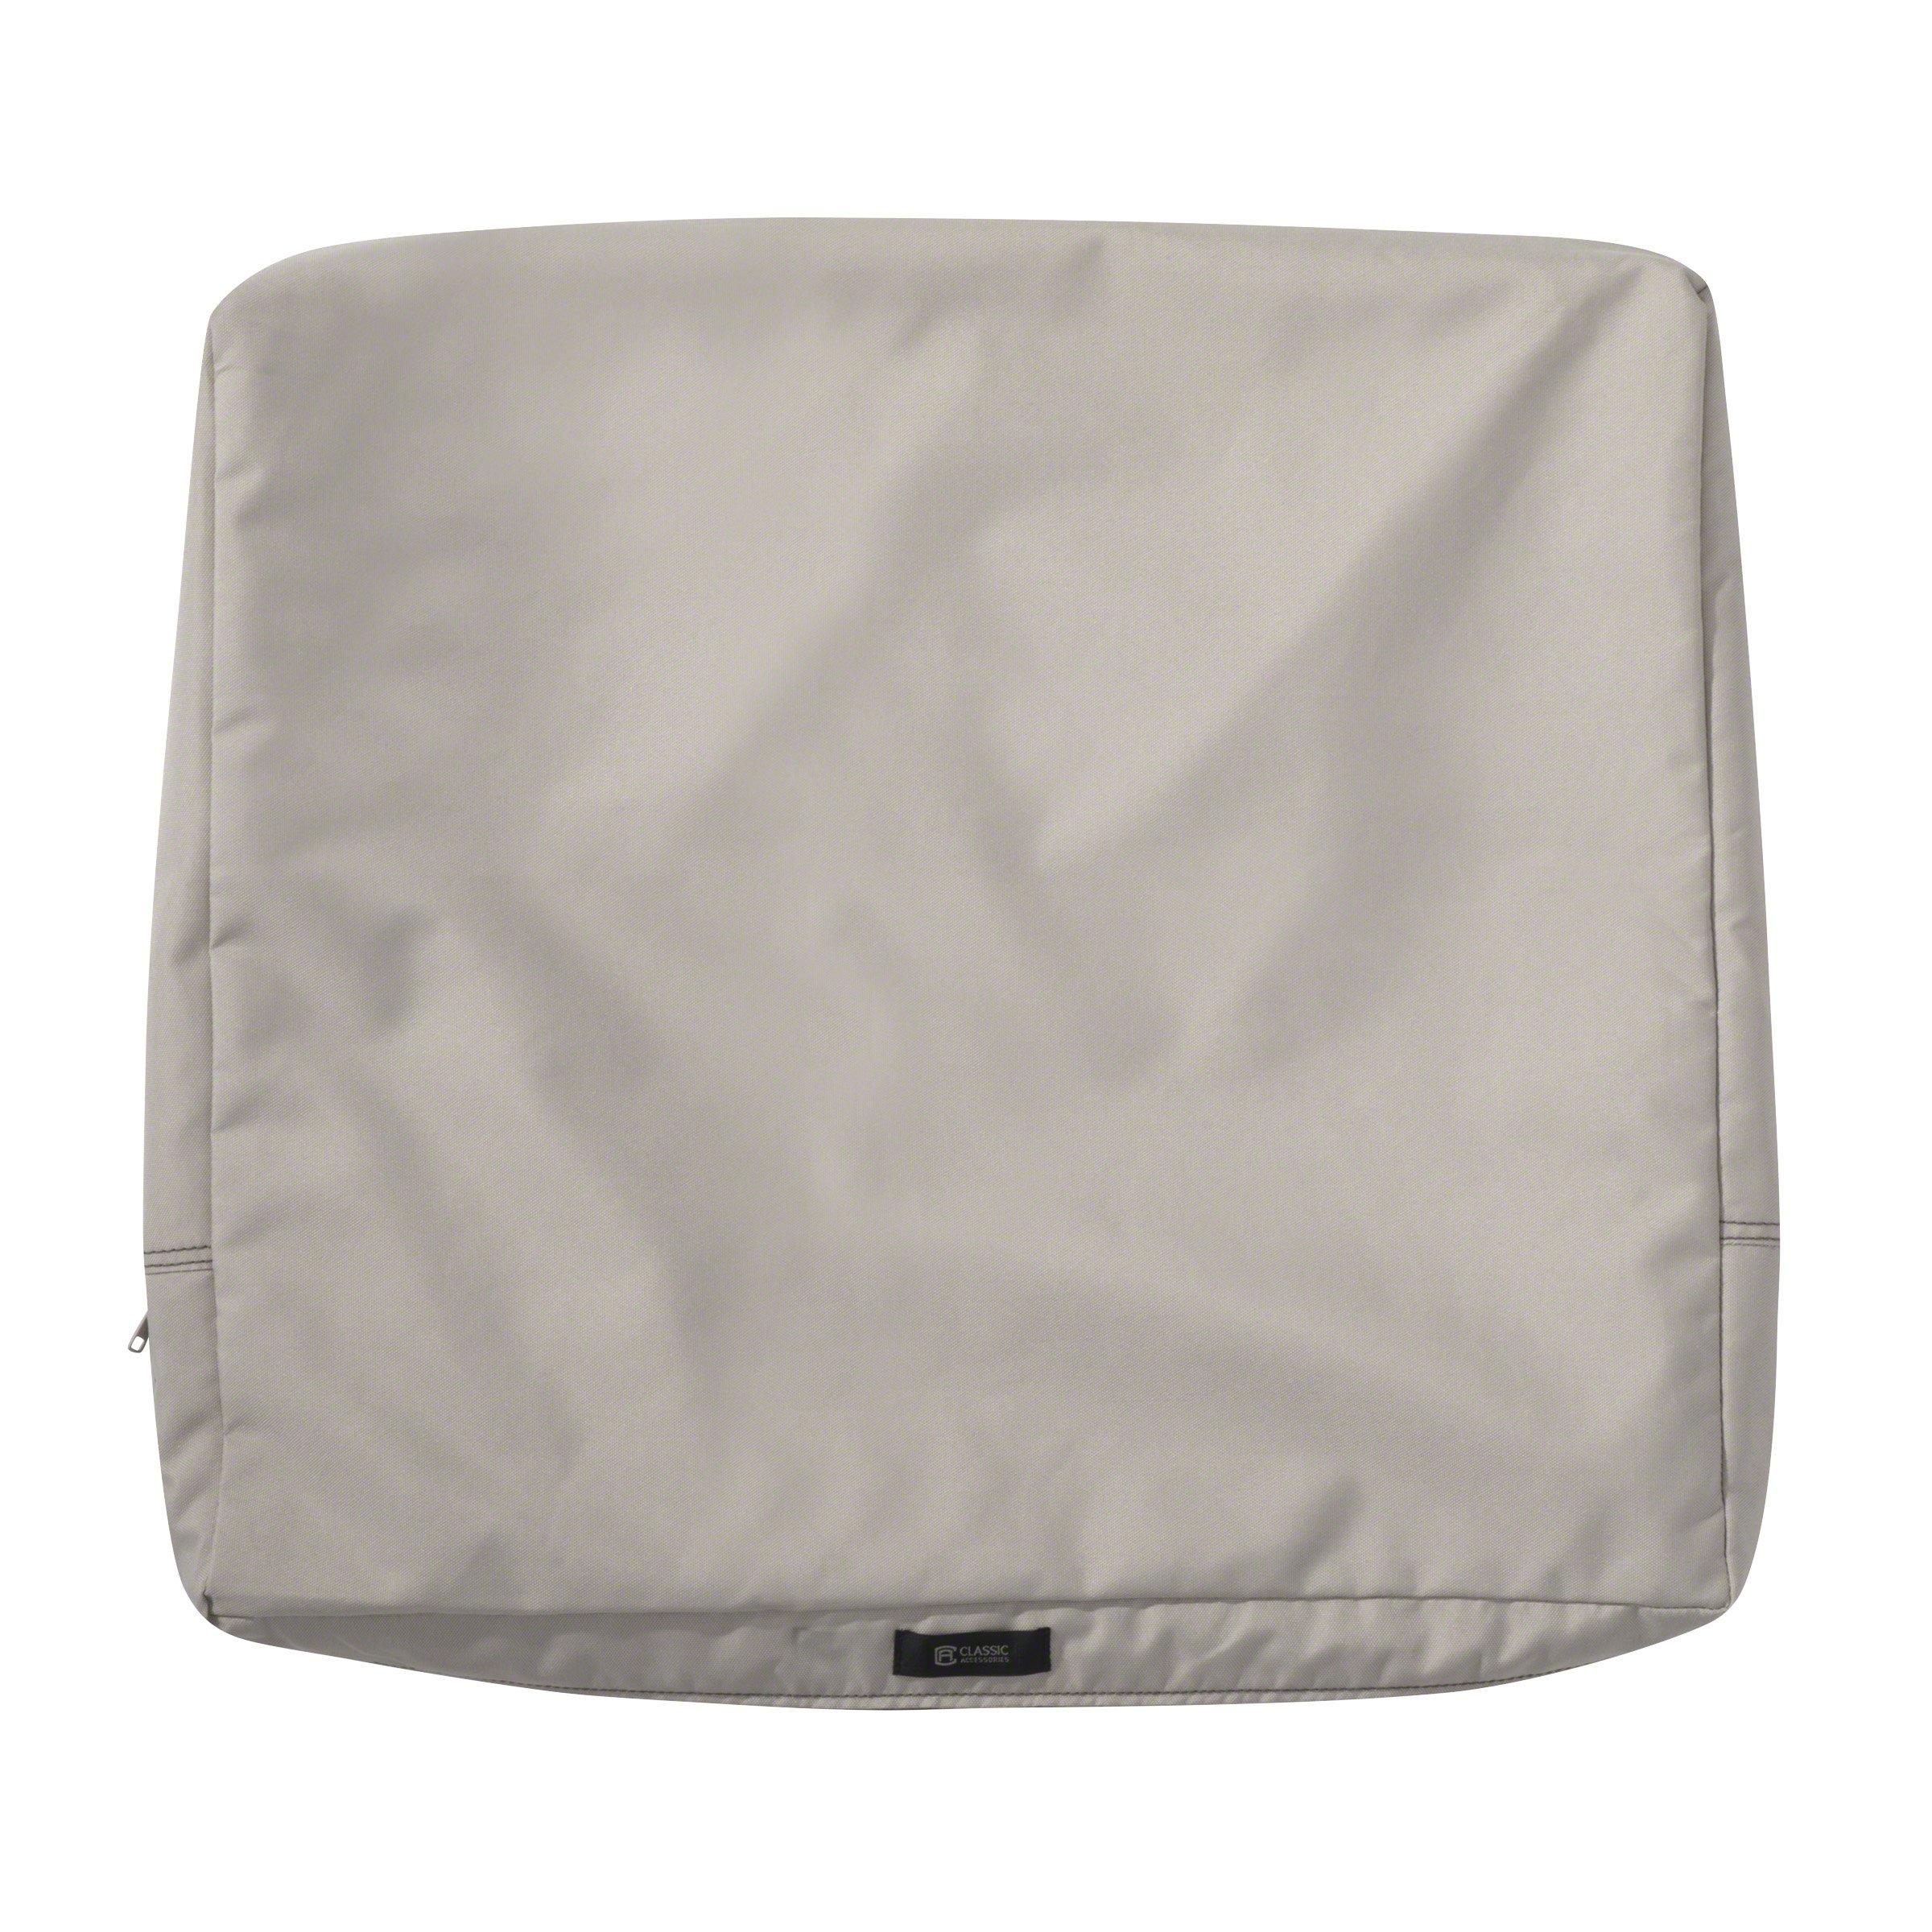 Classic Accessories 60-394-016401-RT Ravenna Cushion Slip Cover, 25'' H x 22'' W x 4'' T, Mushroom